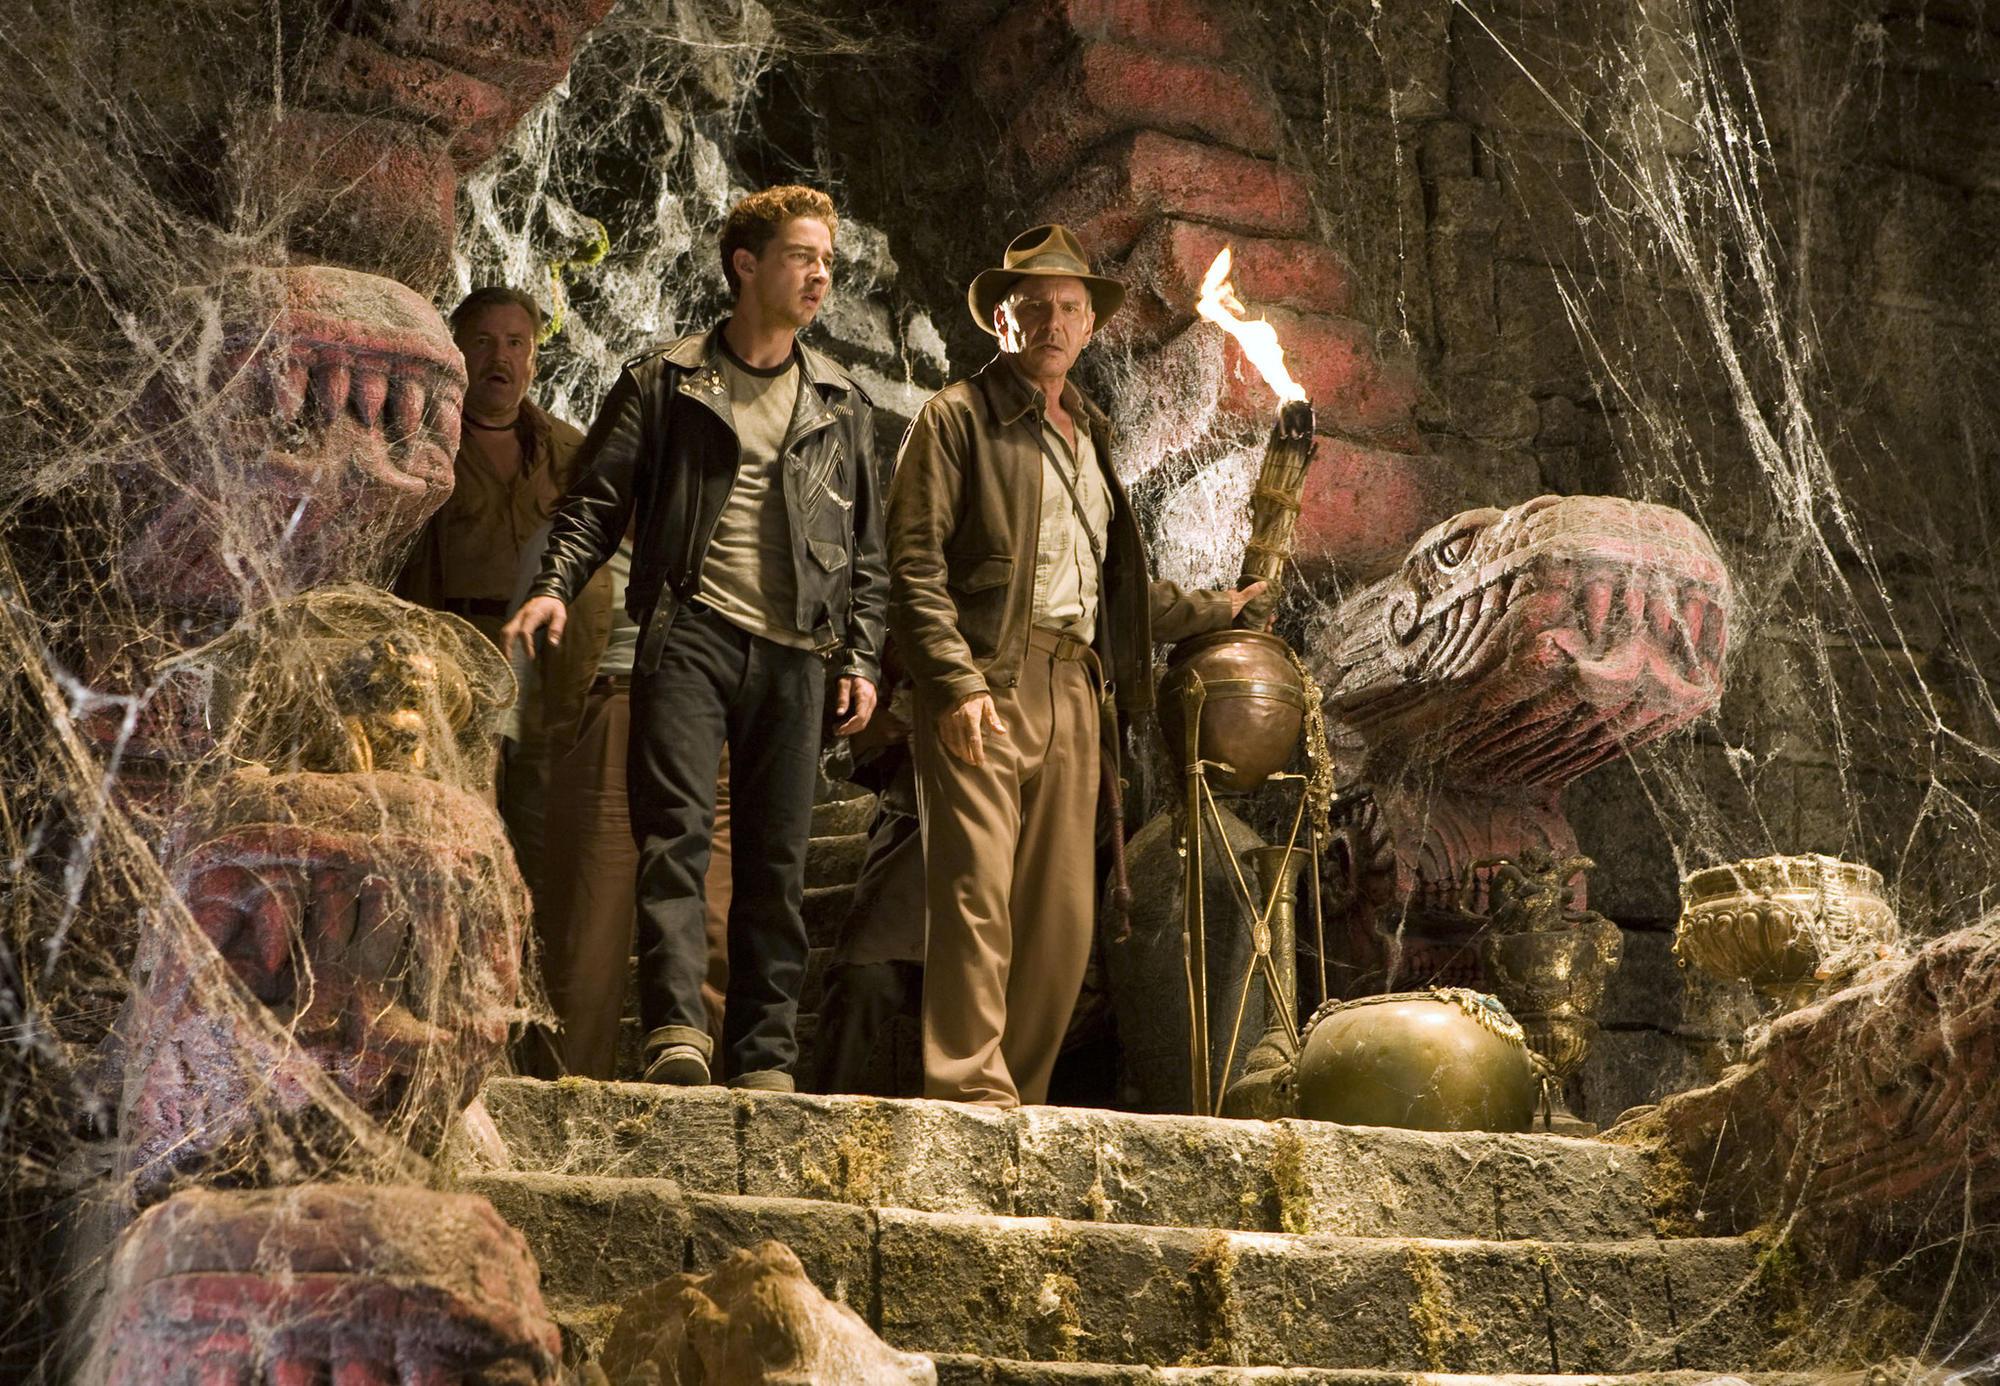 'Indiana Jones and the Kingdom of the Crystal Skull'